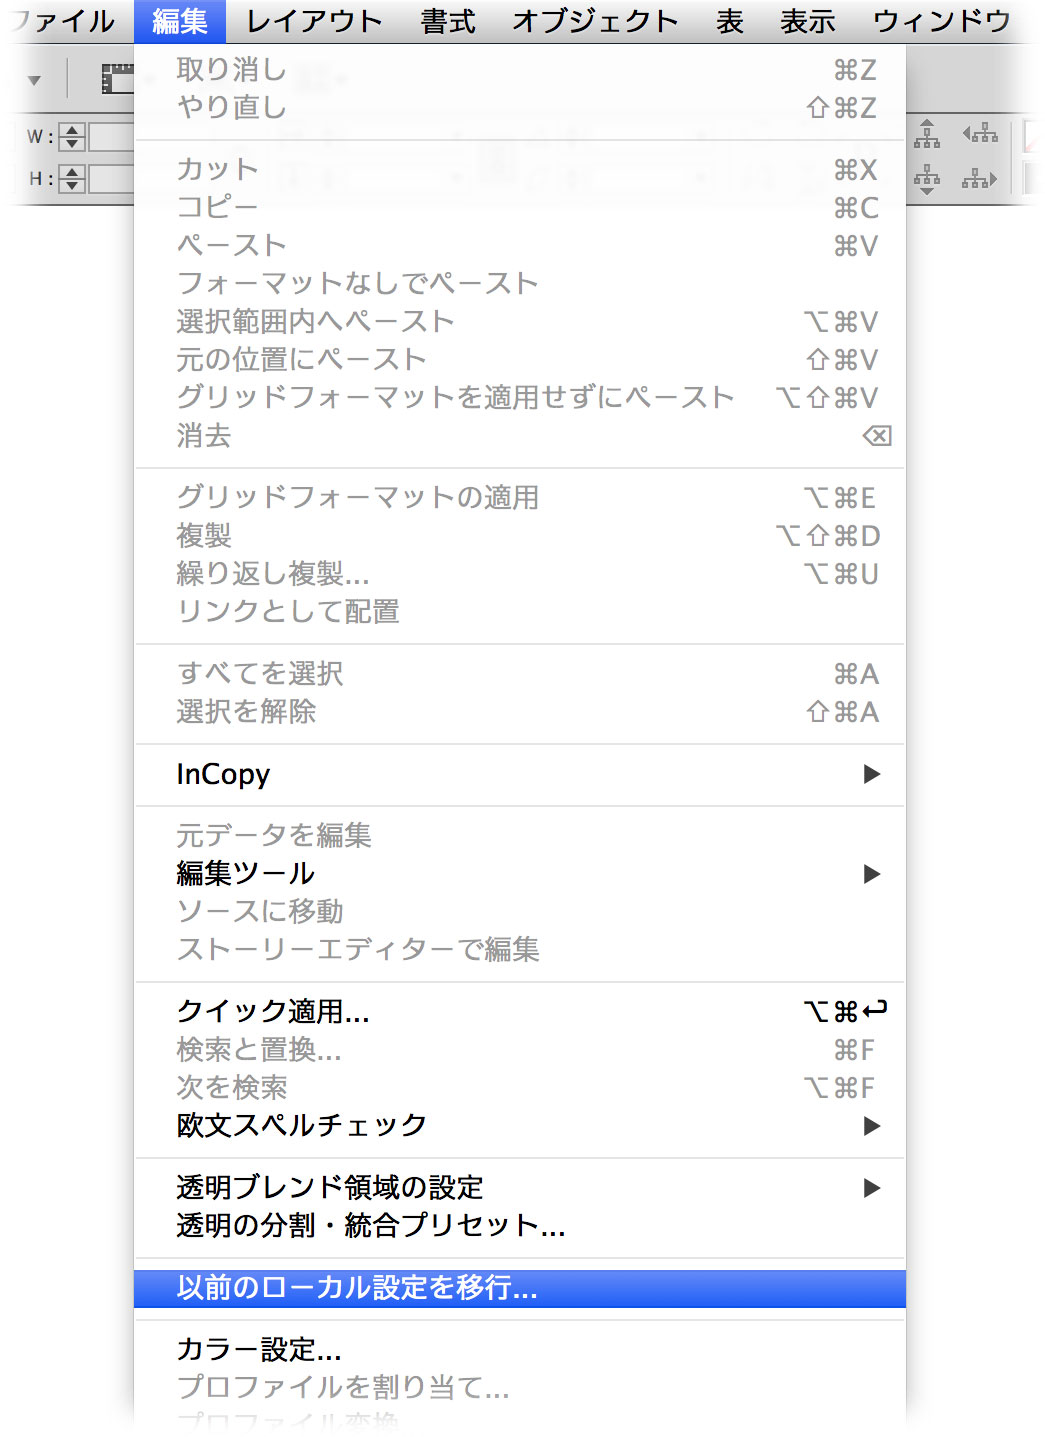 InDDCC2014-import-setting.jpg